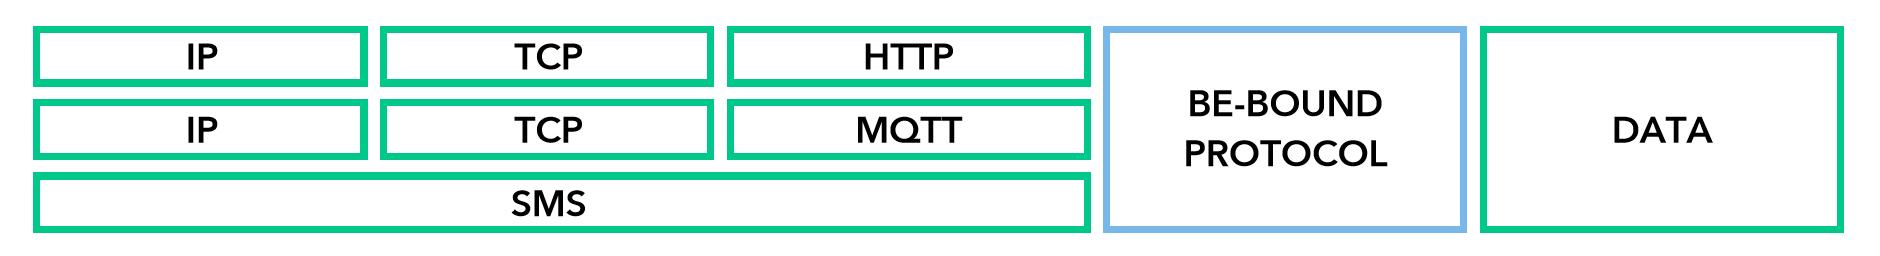 Be-Bound Network Agnostic Protocol